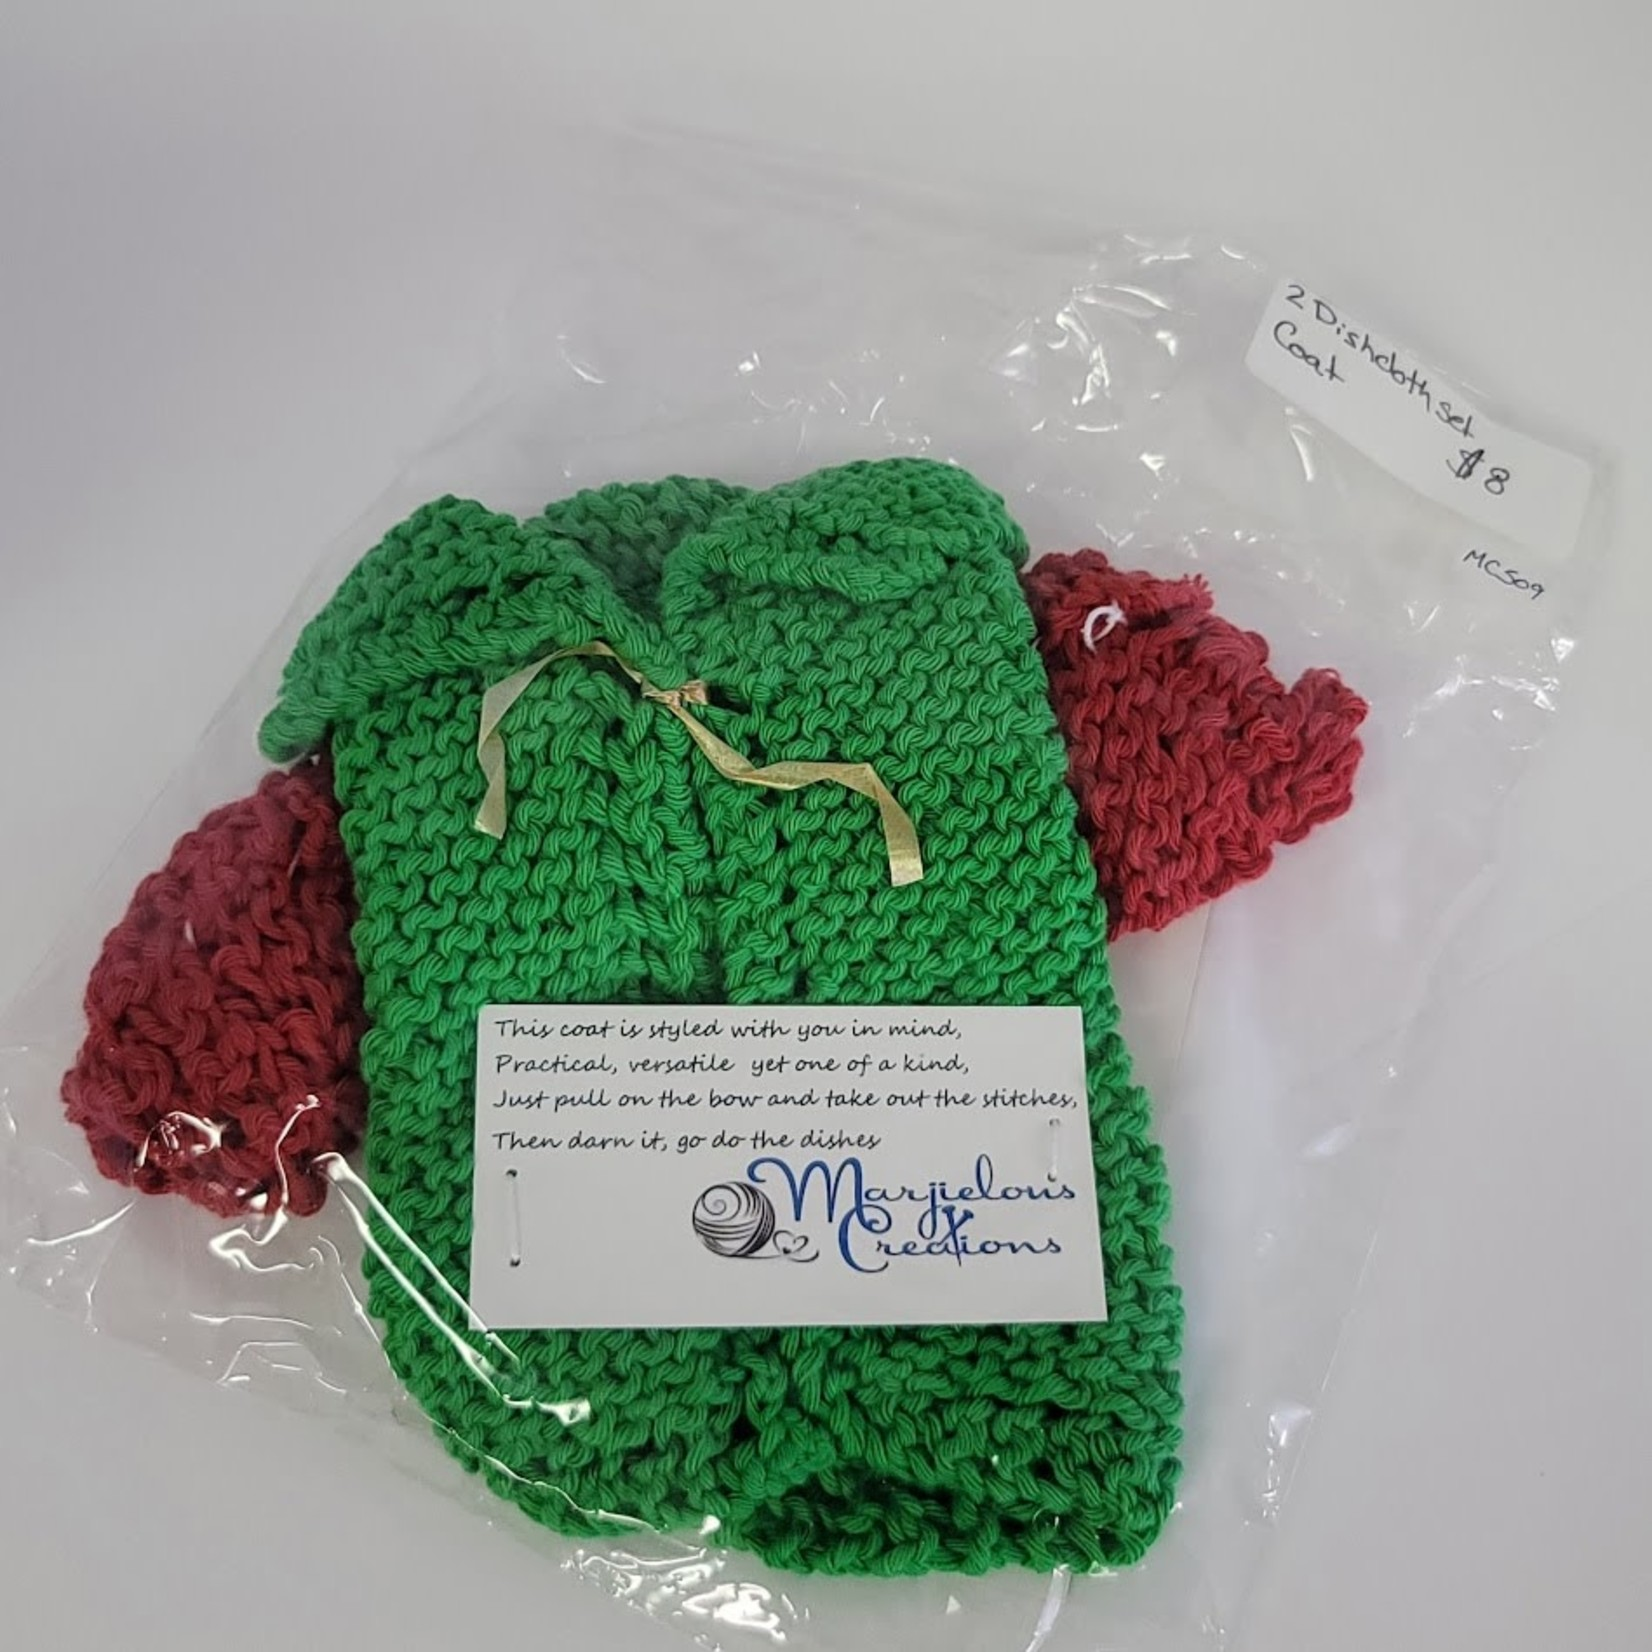 Marjielous Creations Dishcloth Coat (set of 2) 100% Cotton